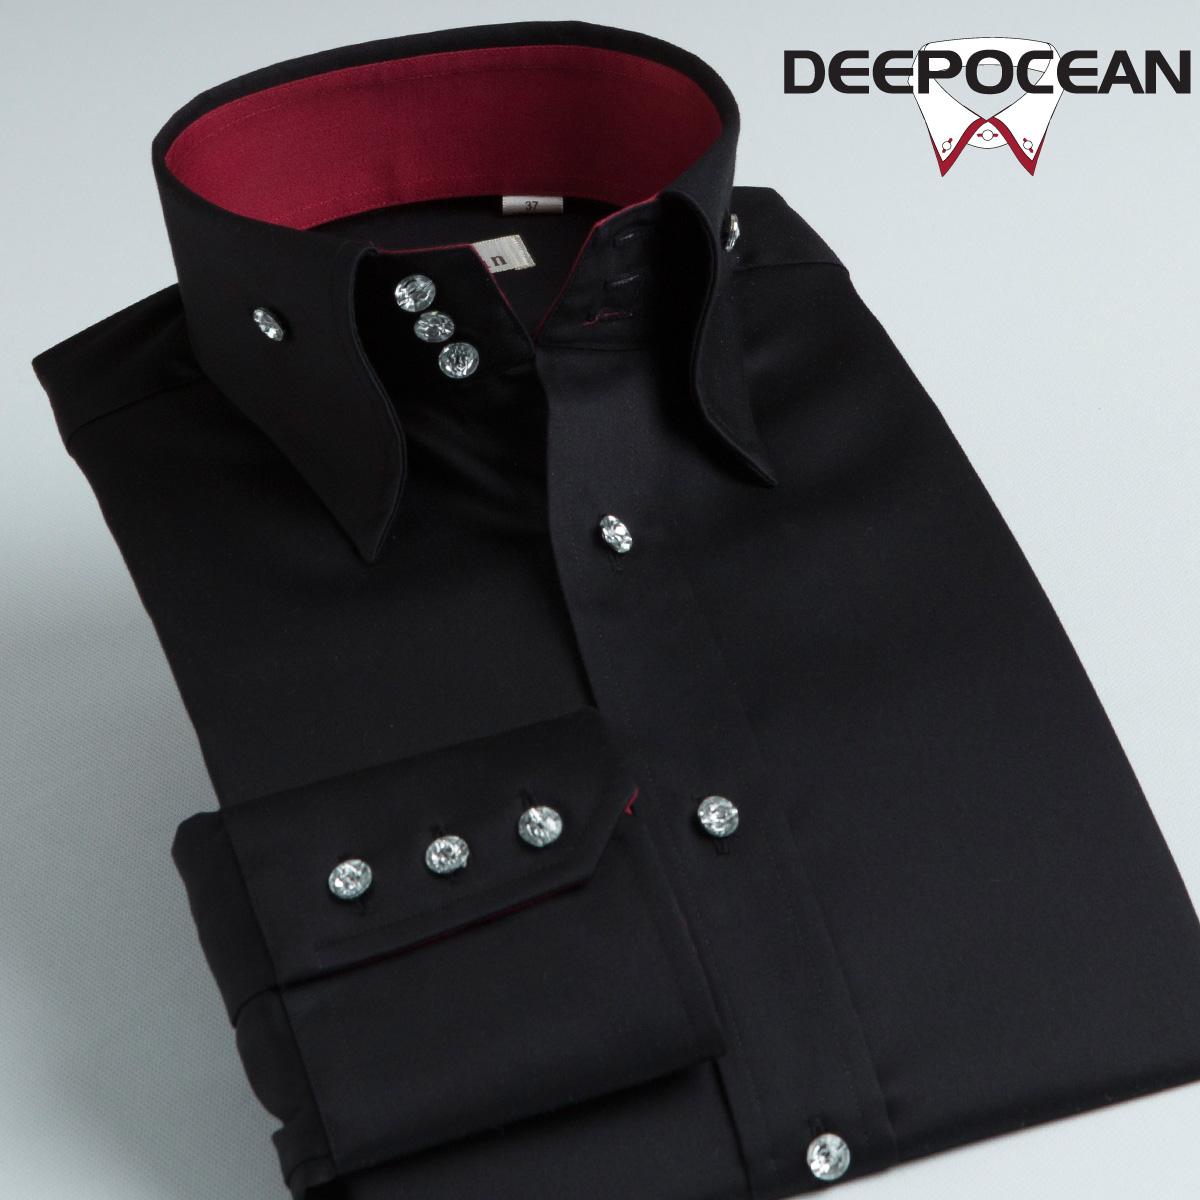 DeepOcean深海男士衬衫长袖2013春秋黑衬衣韩版修身潮 丝光棉男装 价格:168.00